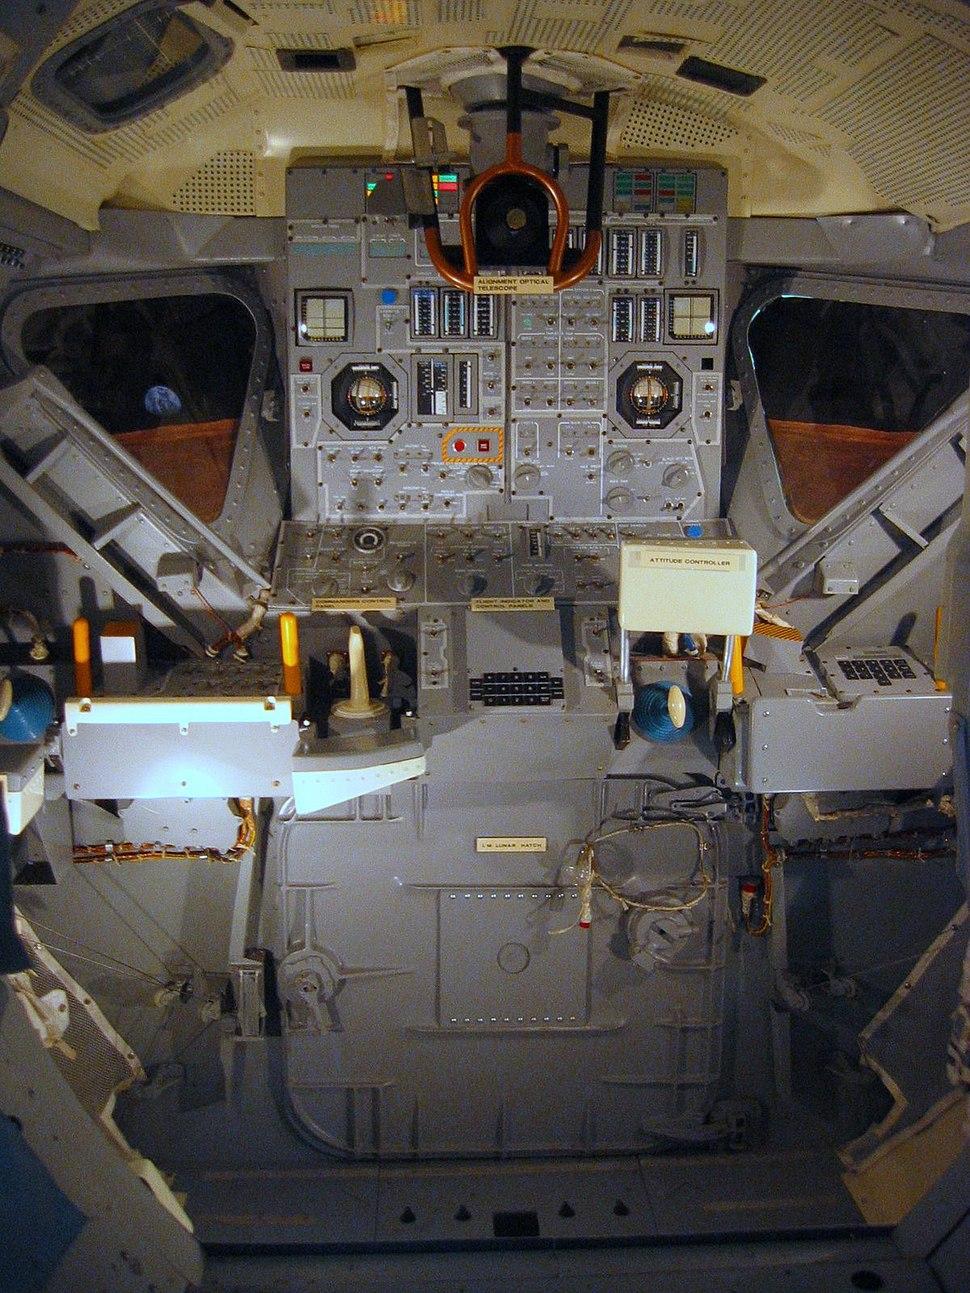 Apollo Lunar Module Inside View